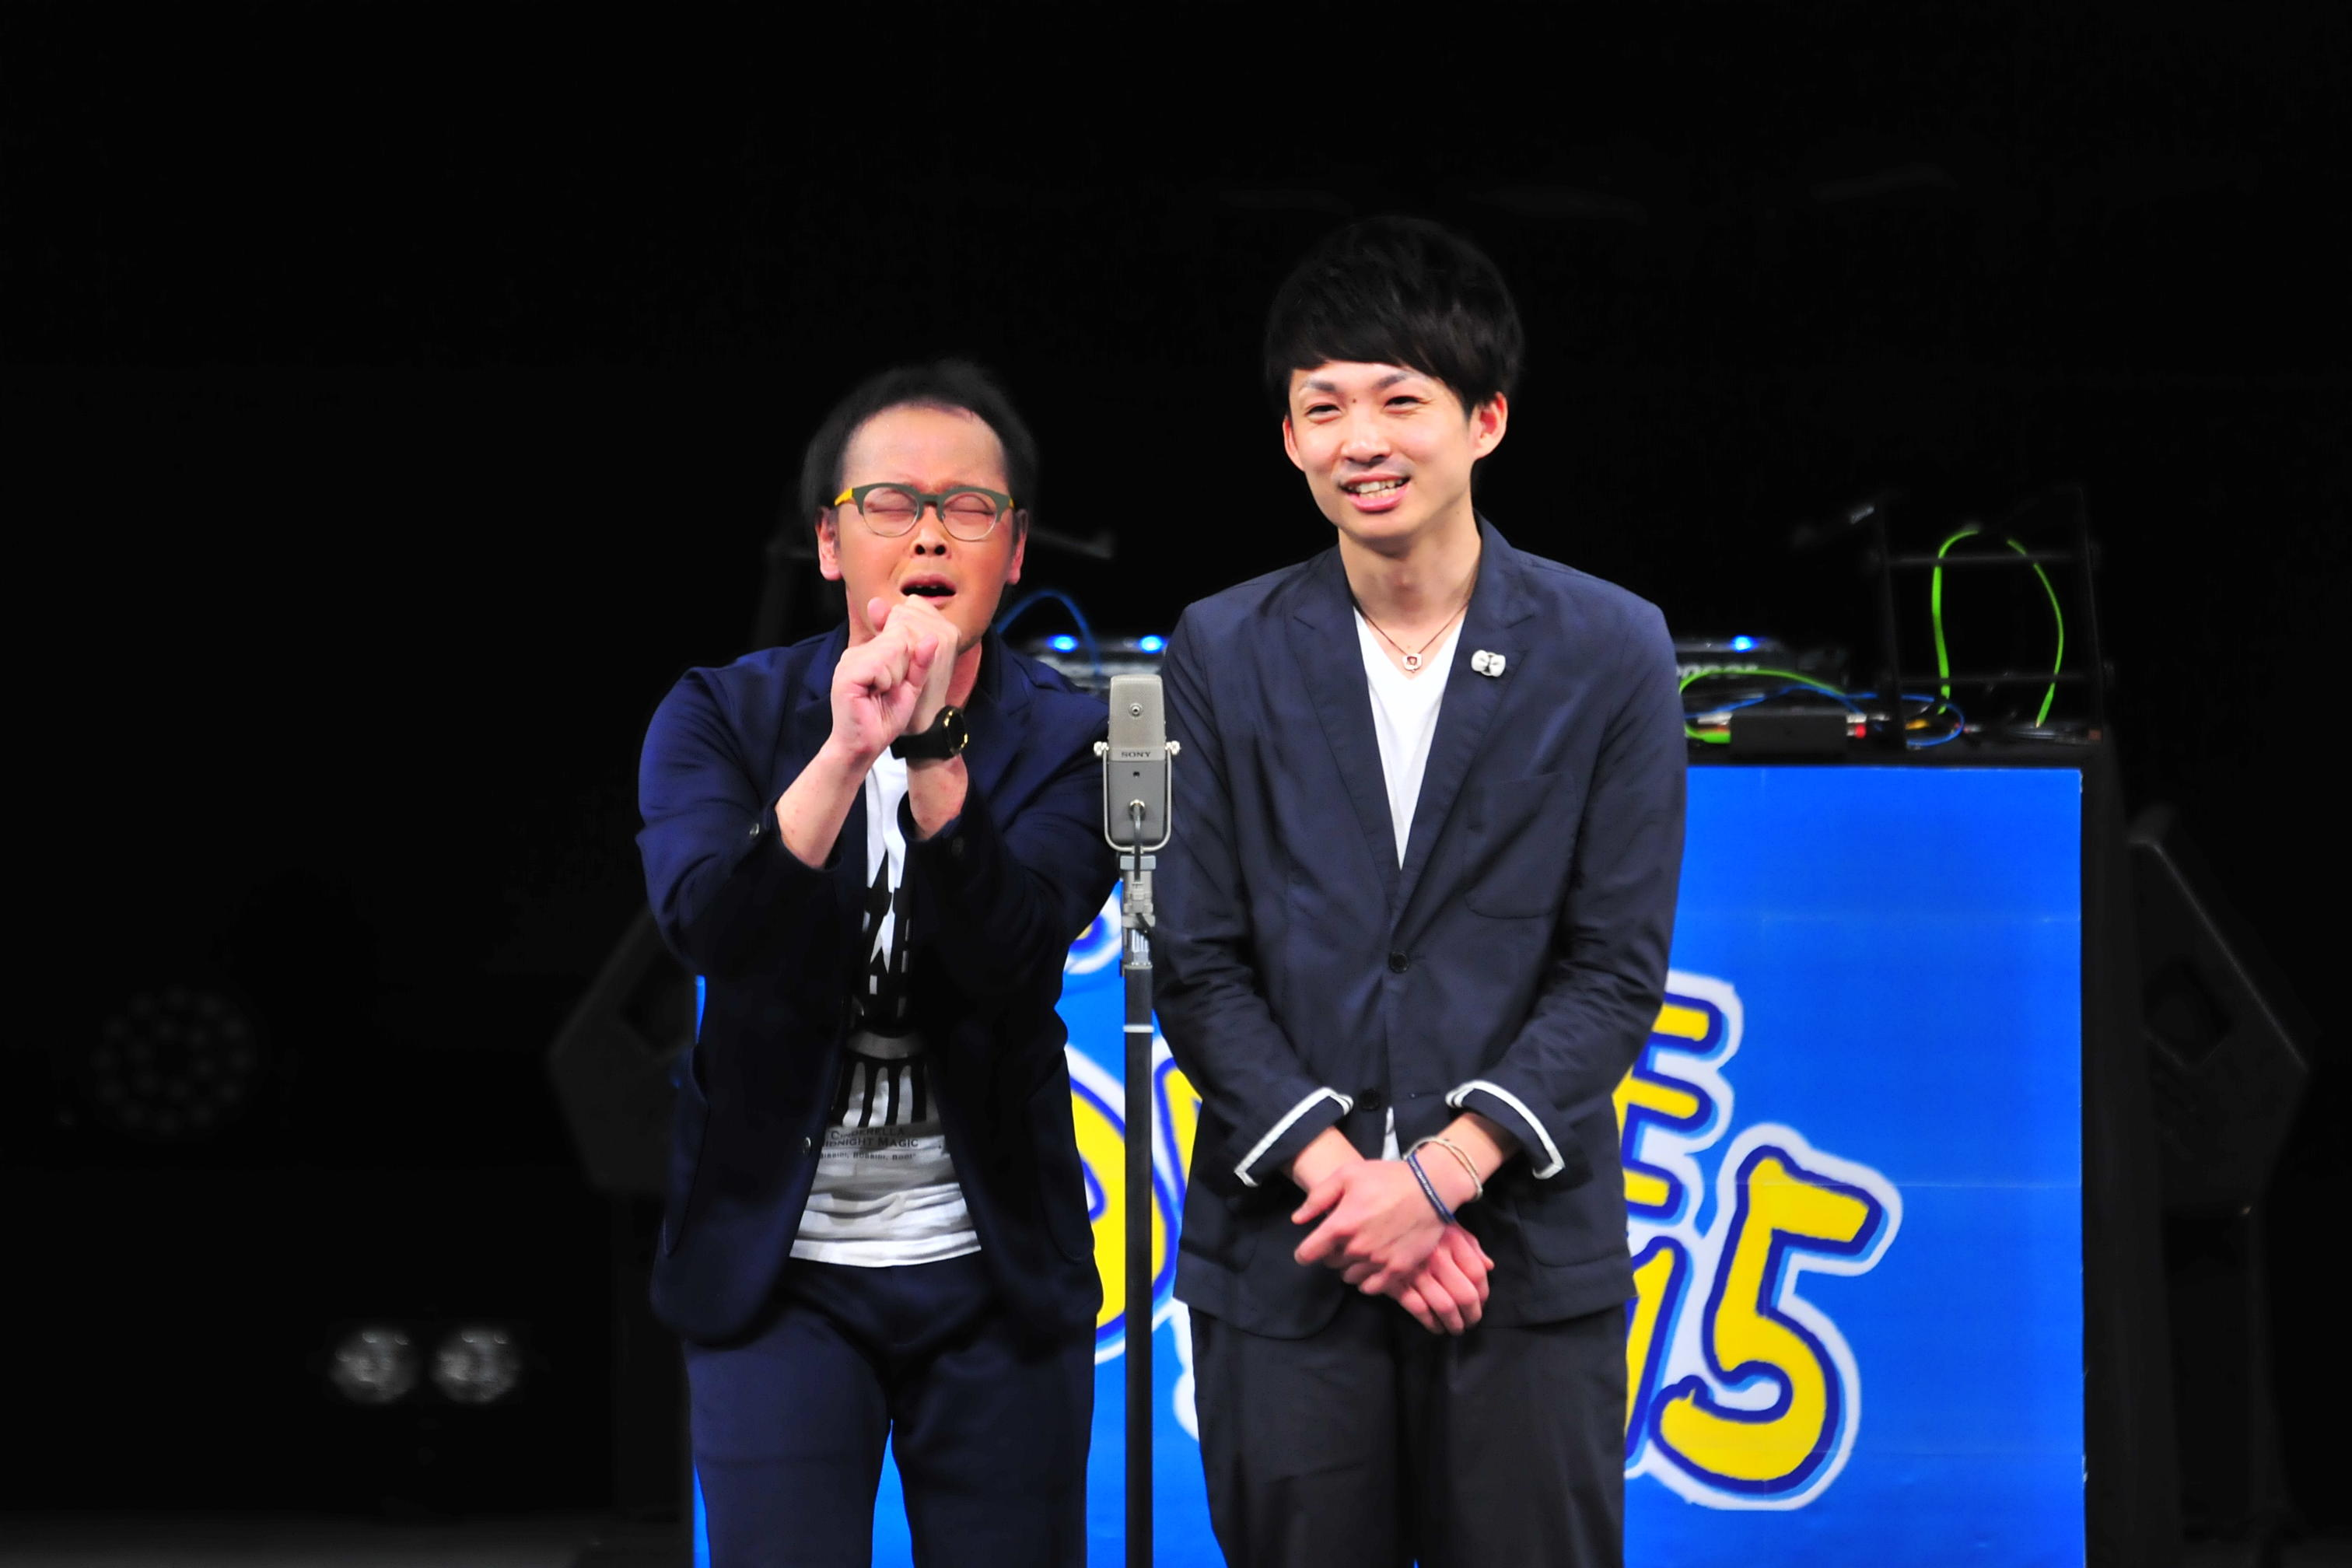 http://news.yoshimoto.co.jp/20151231142729-18477e1dfeb17b896db8fee503d78926bf8e47a2.jpg